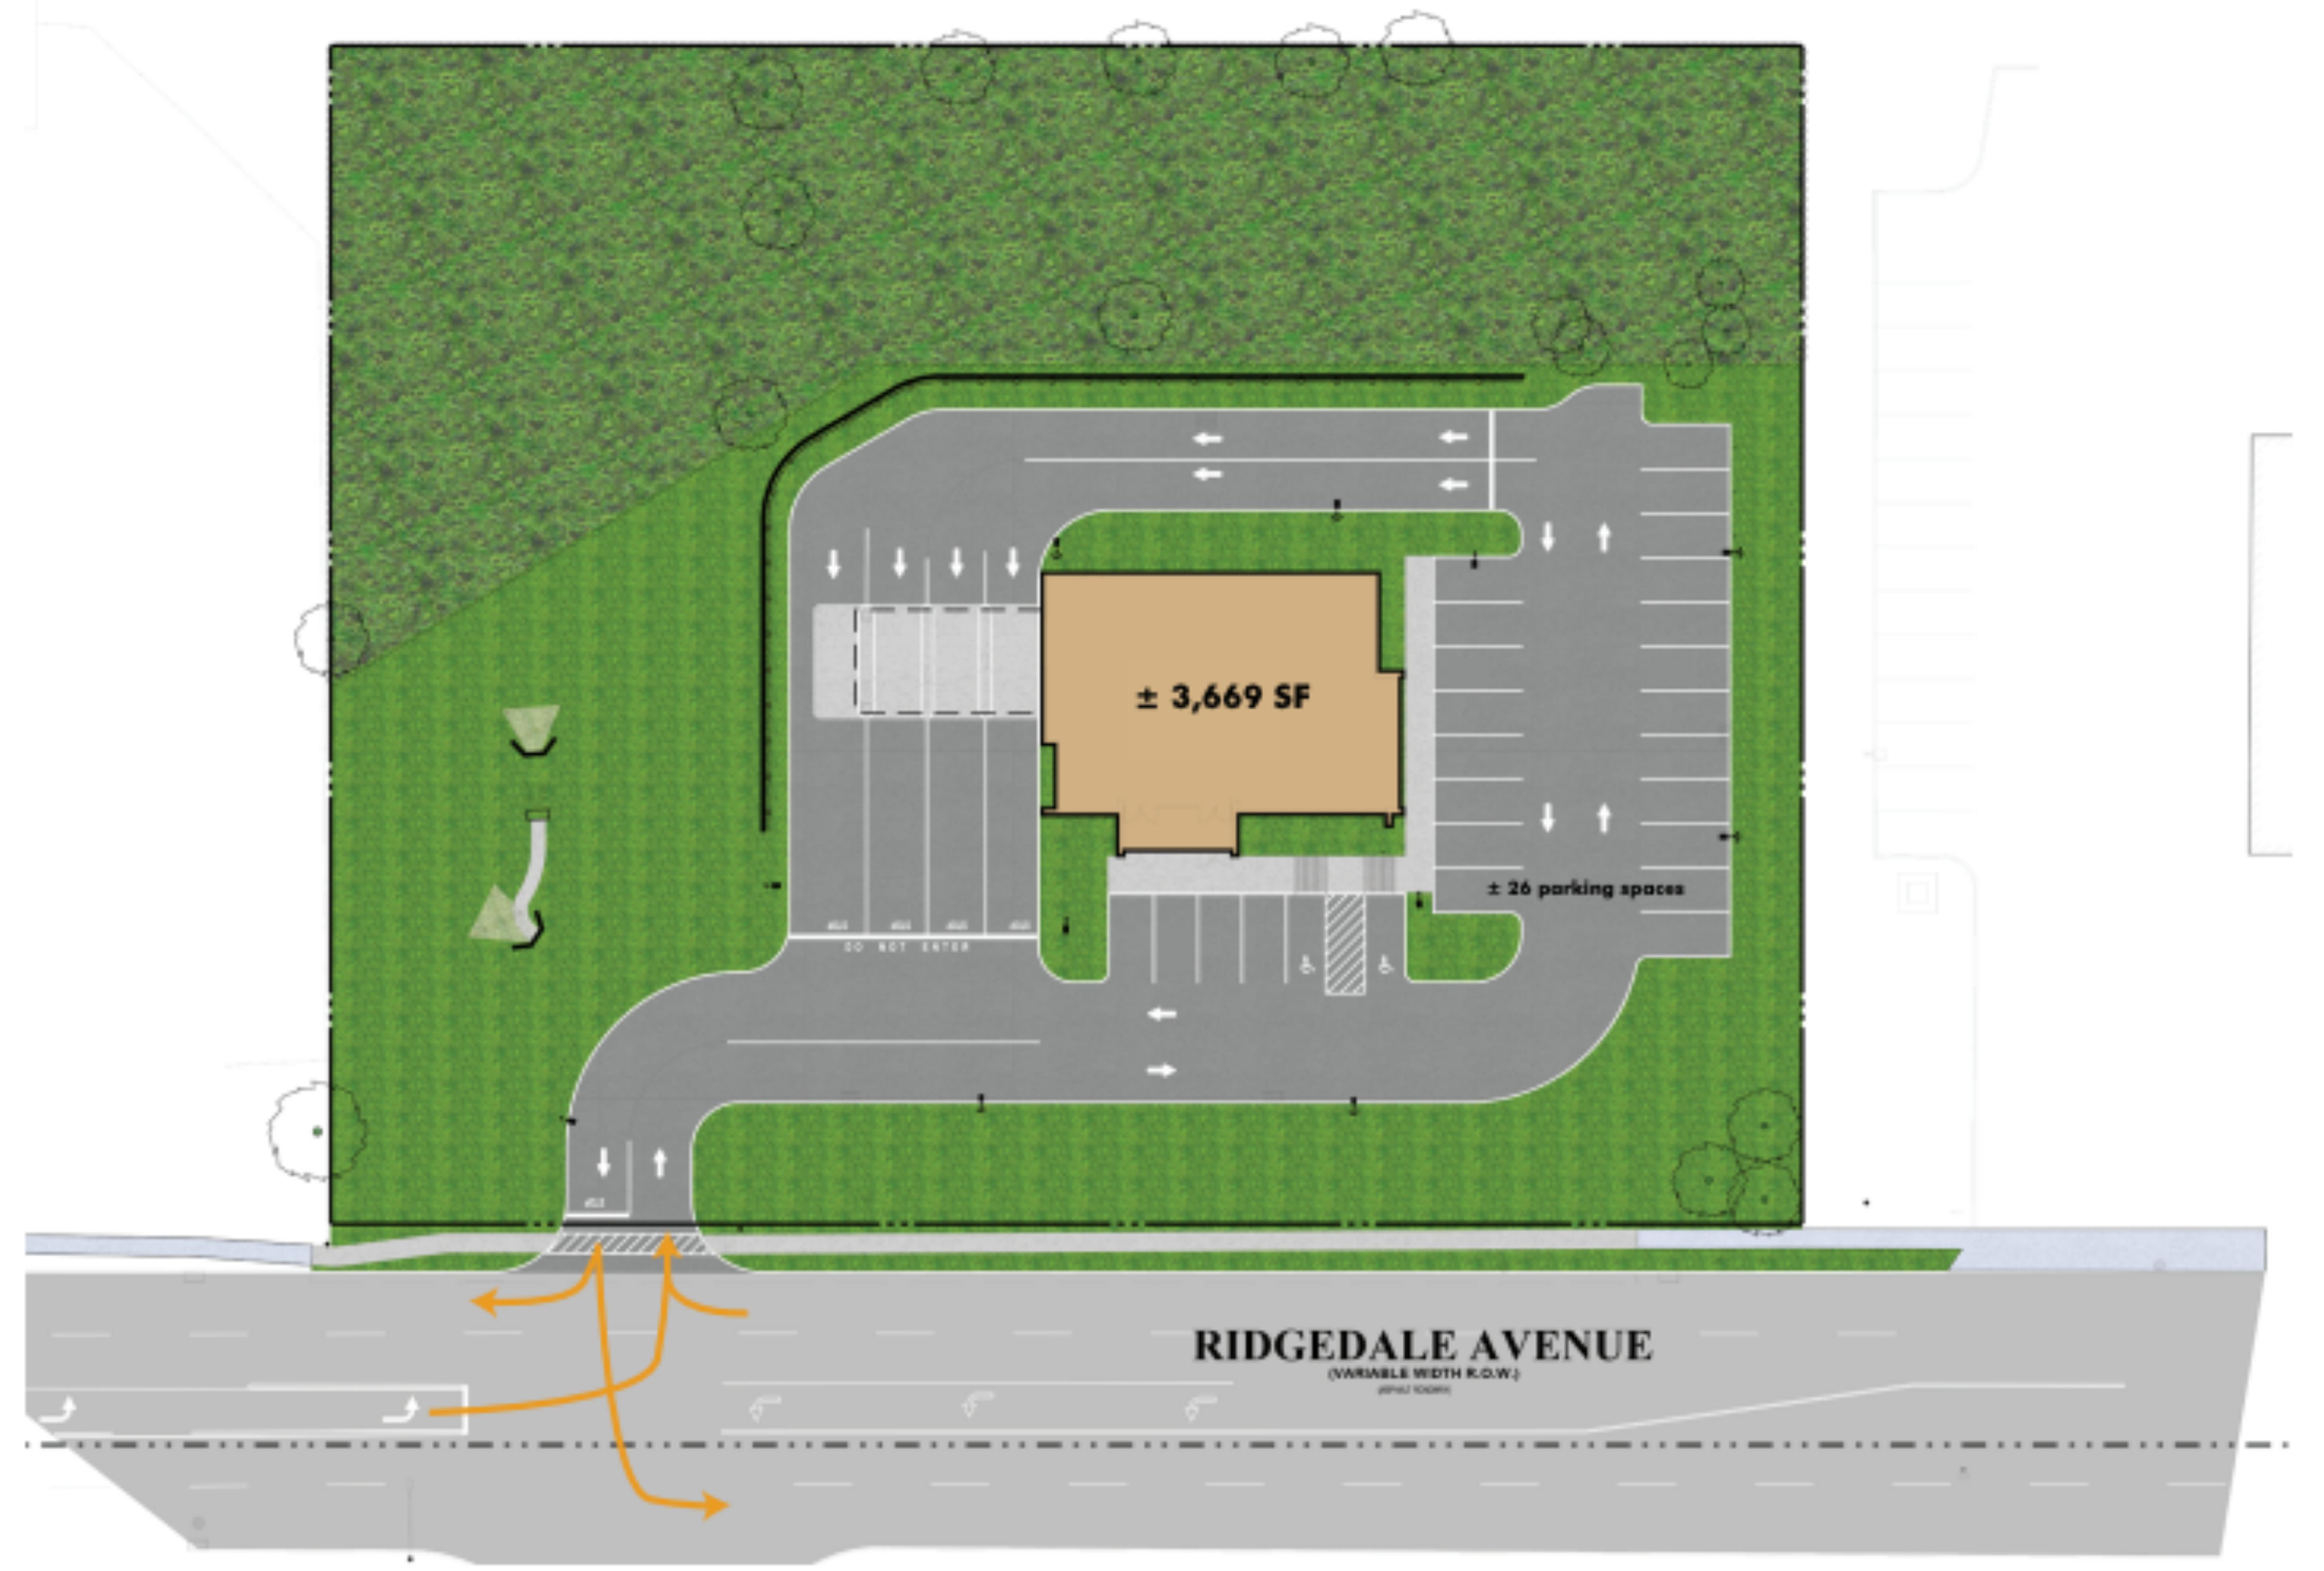 Former Bank - 224 Ridgedale Avenue: site plan